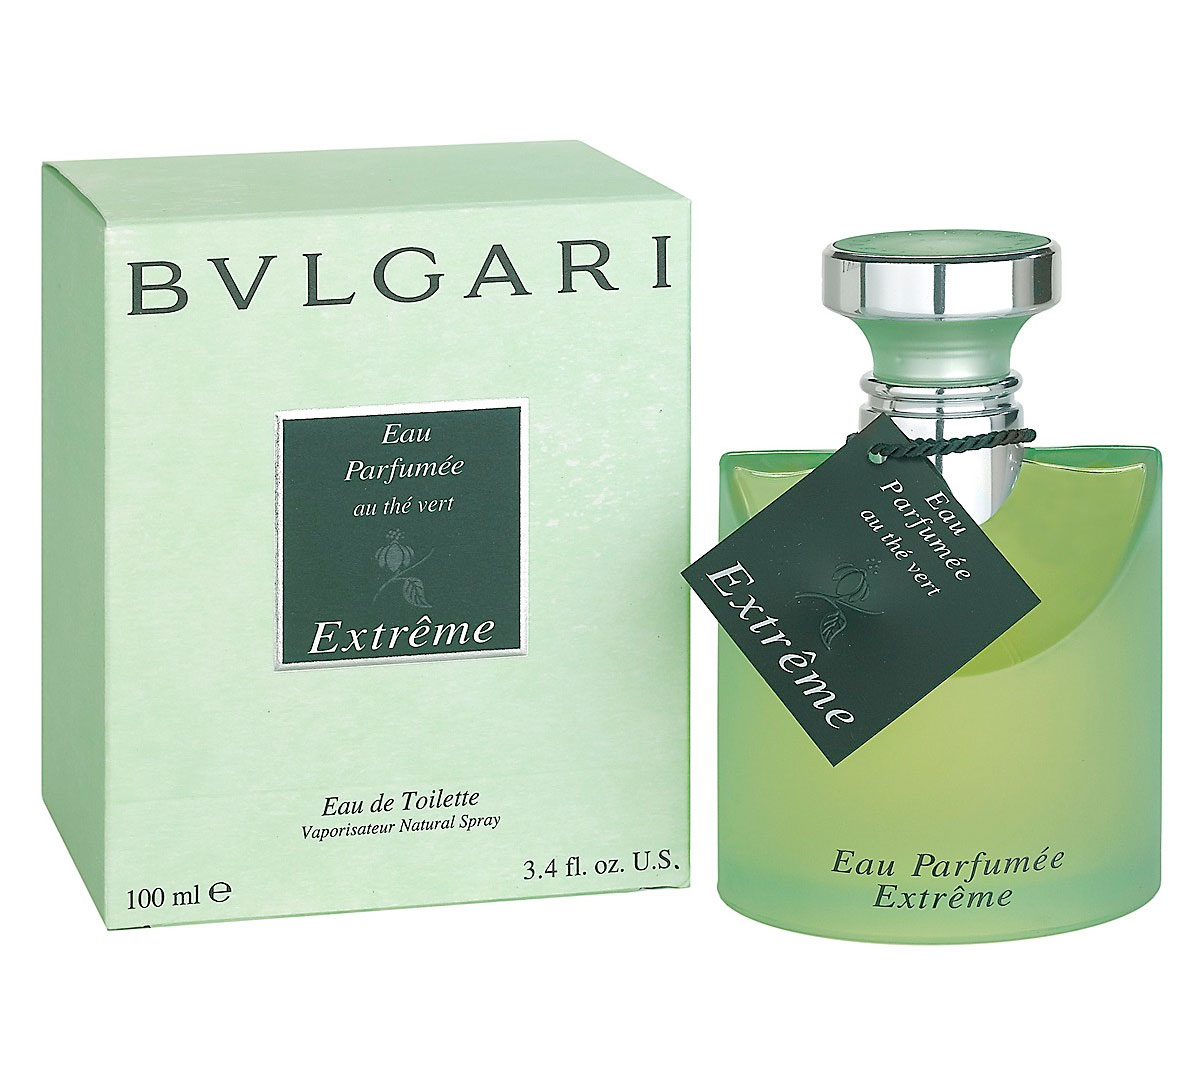 70516f5fcb8a2 ... Bvlgari Eau Parfumee au The Vert Extreme Bvlgari Compartilhável Imagens